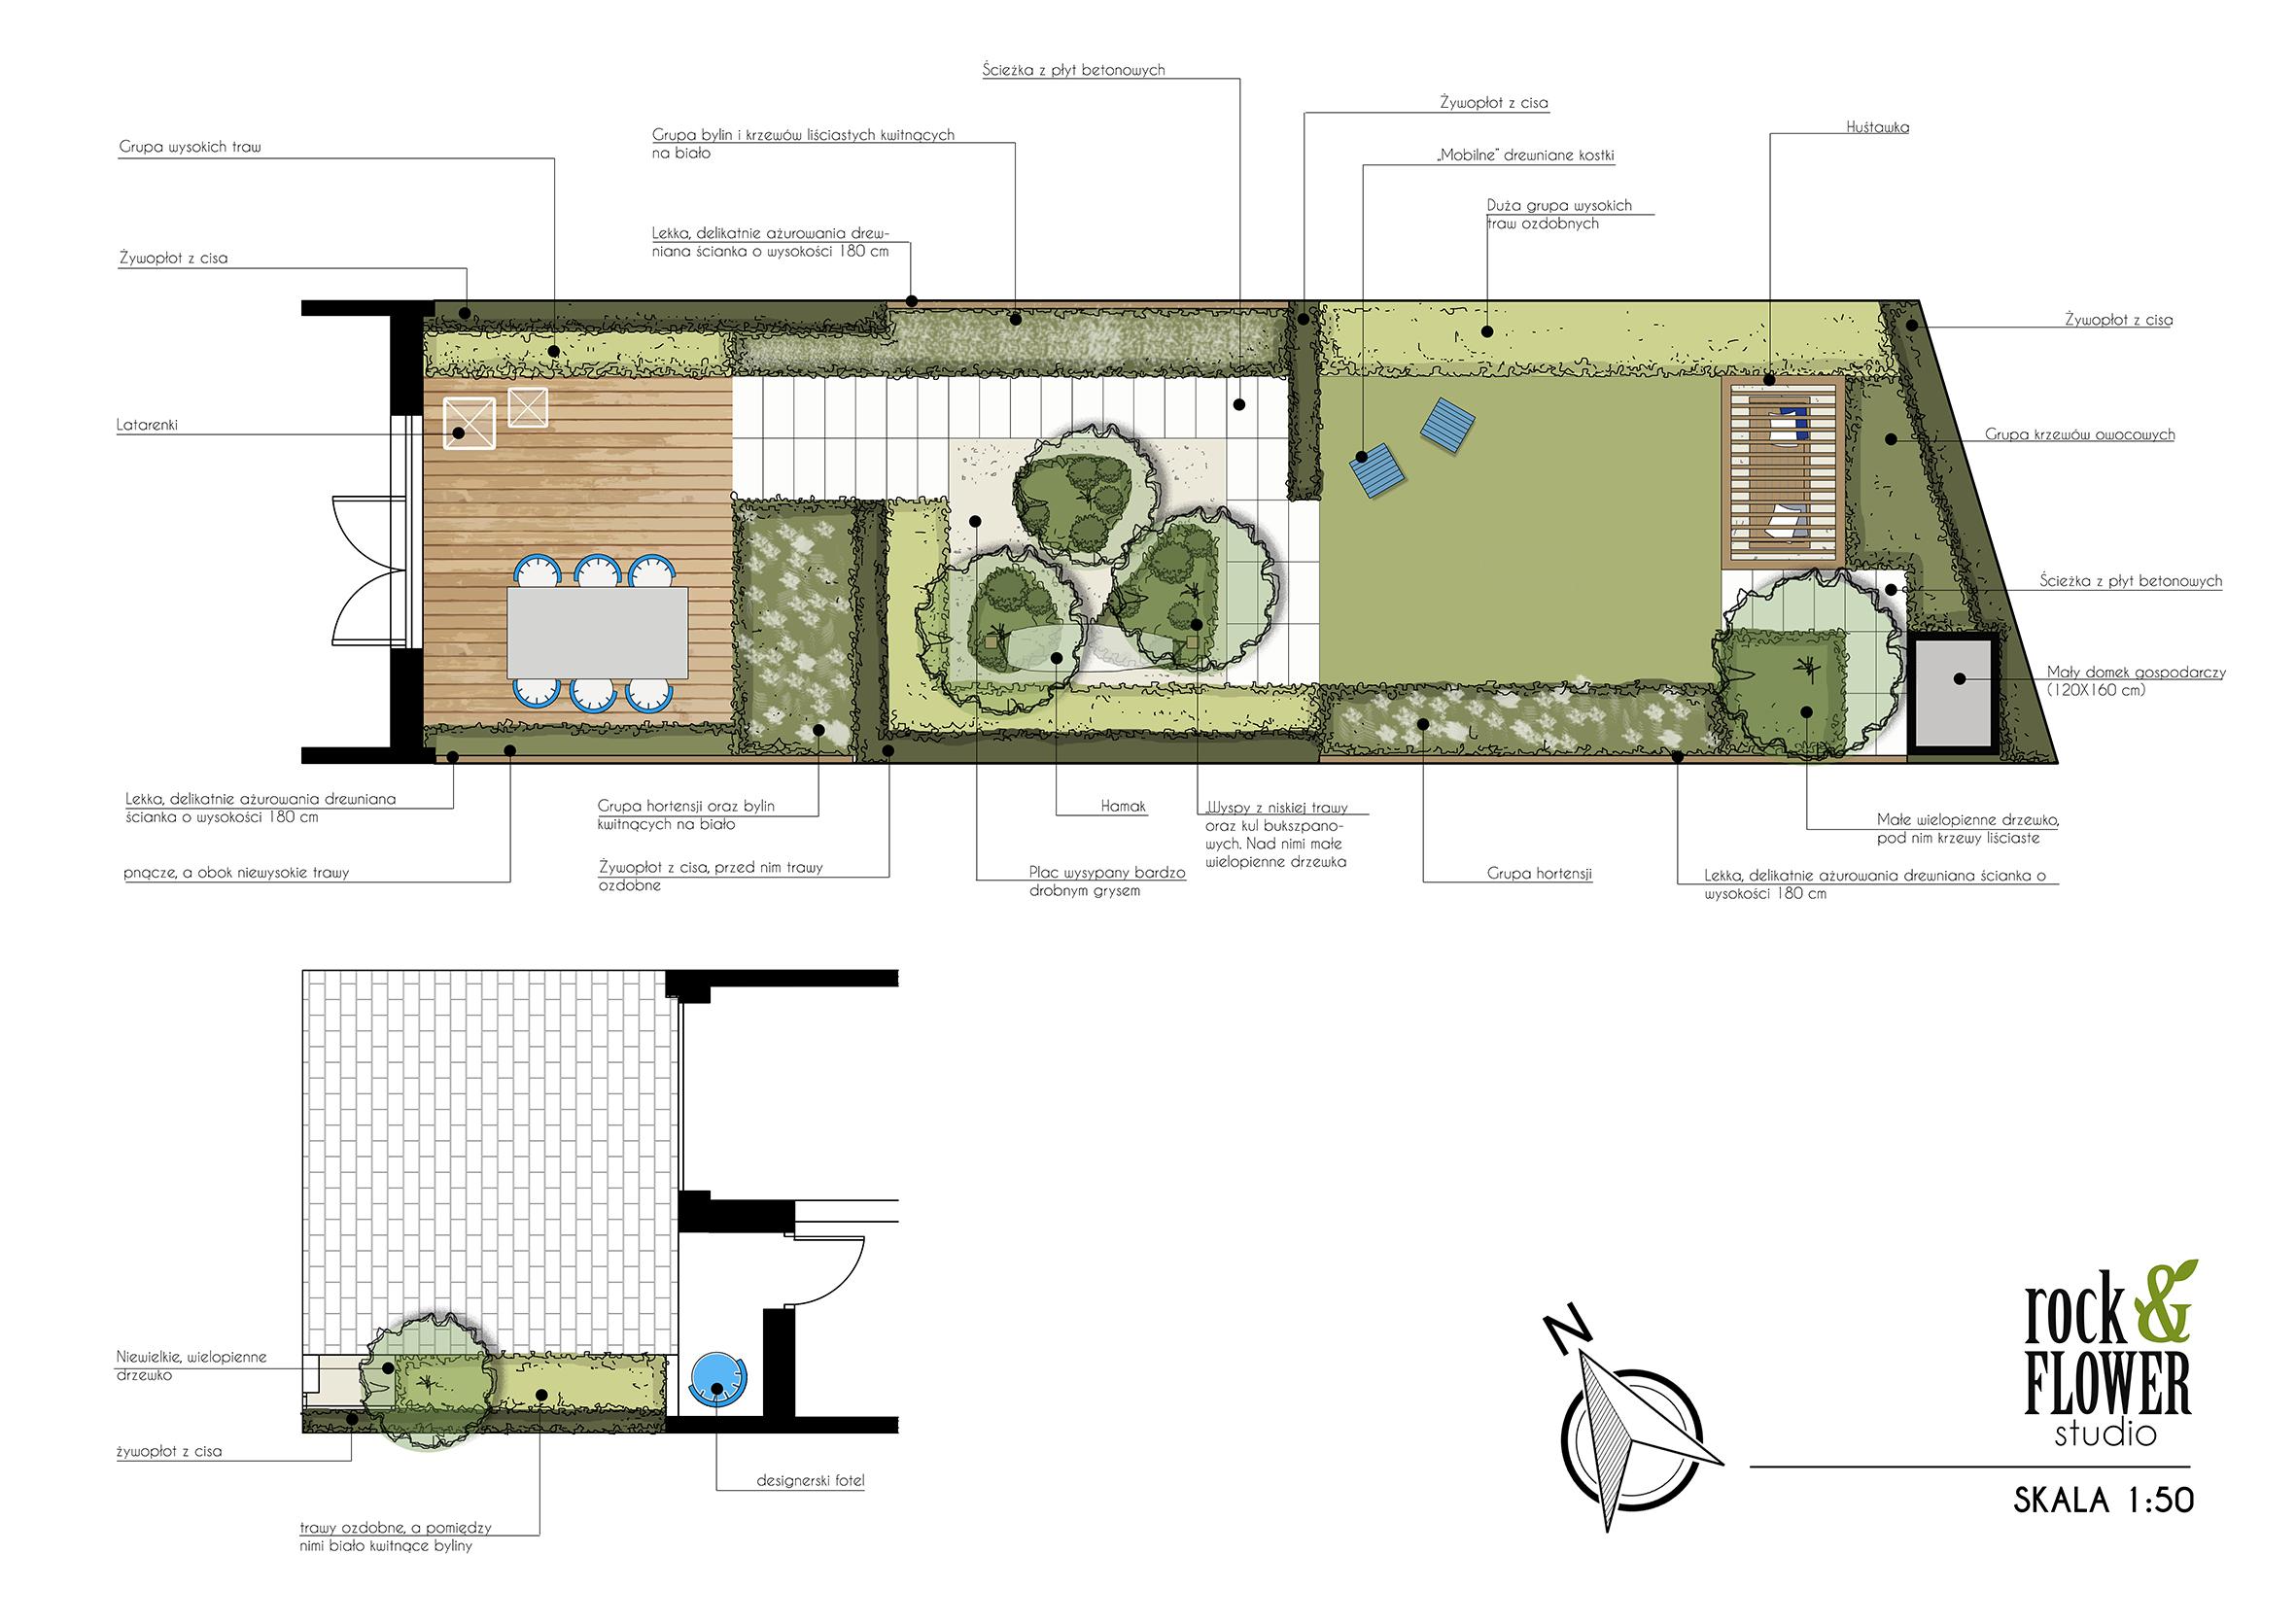 Zahrada-u-radoveho-domu-praha-zahradniarchitekt-zahradni-architektura-projekt-zahrady